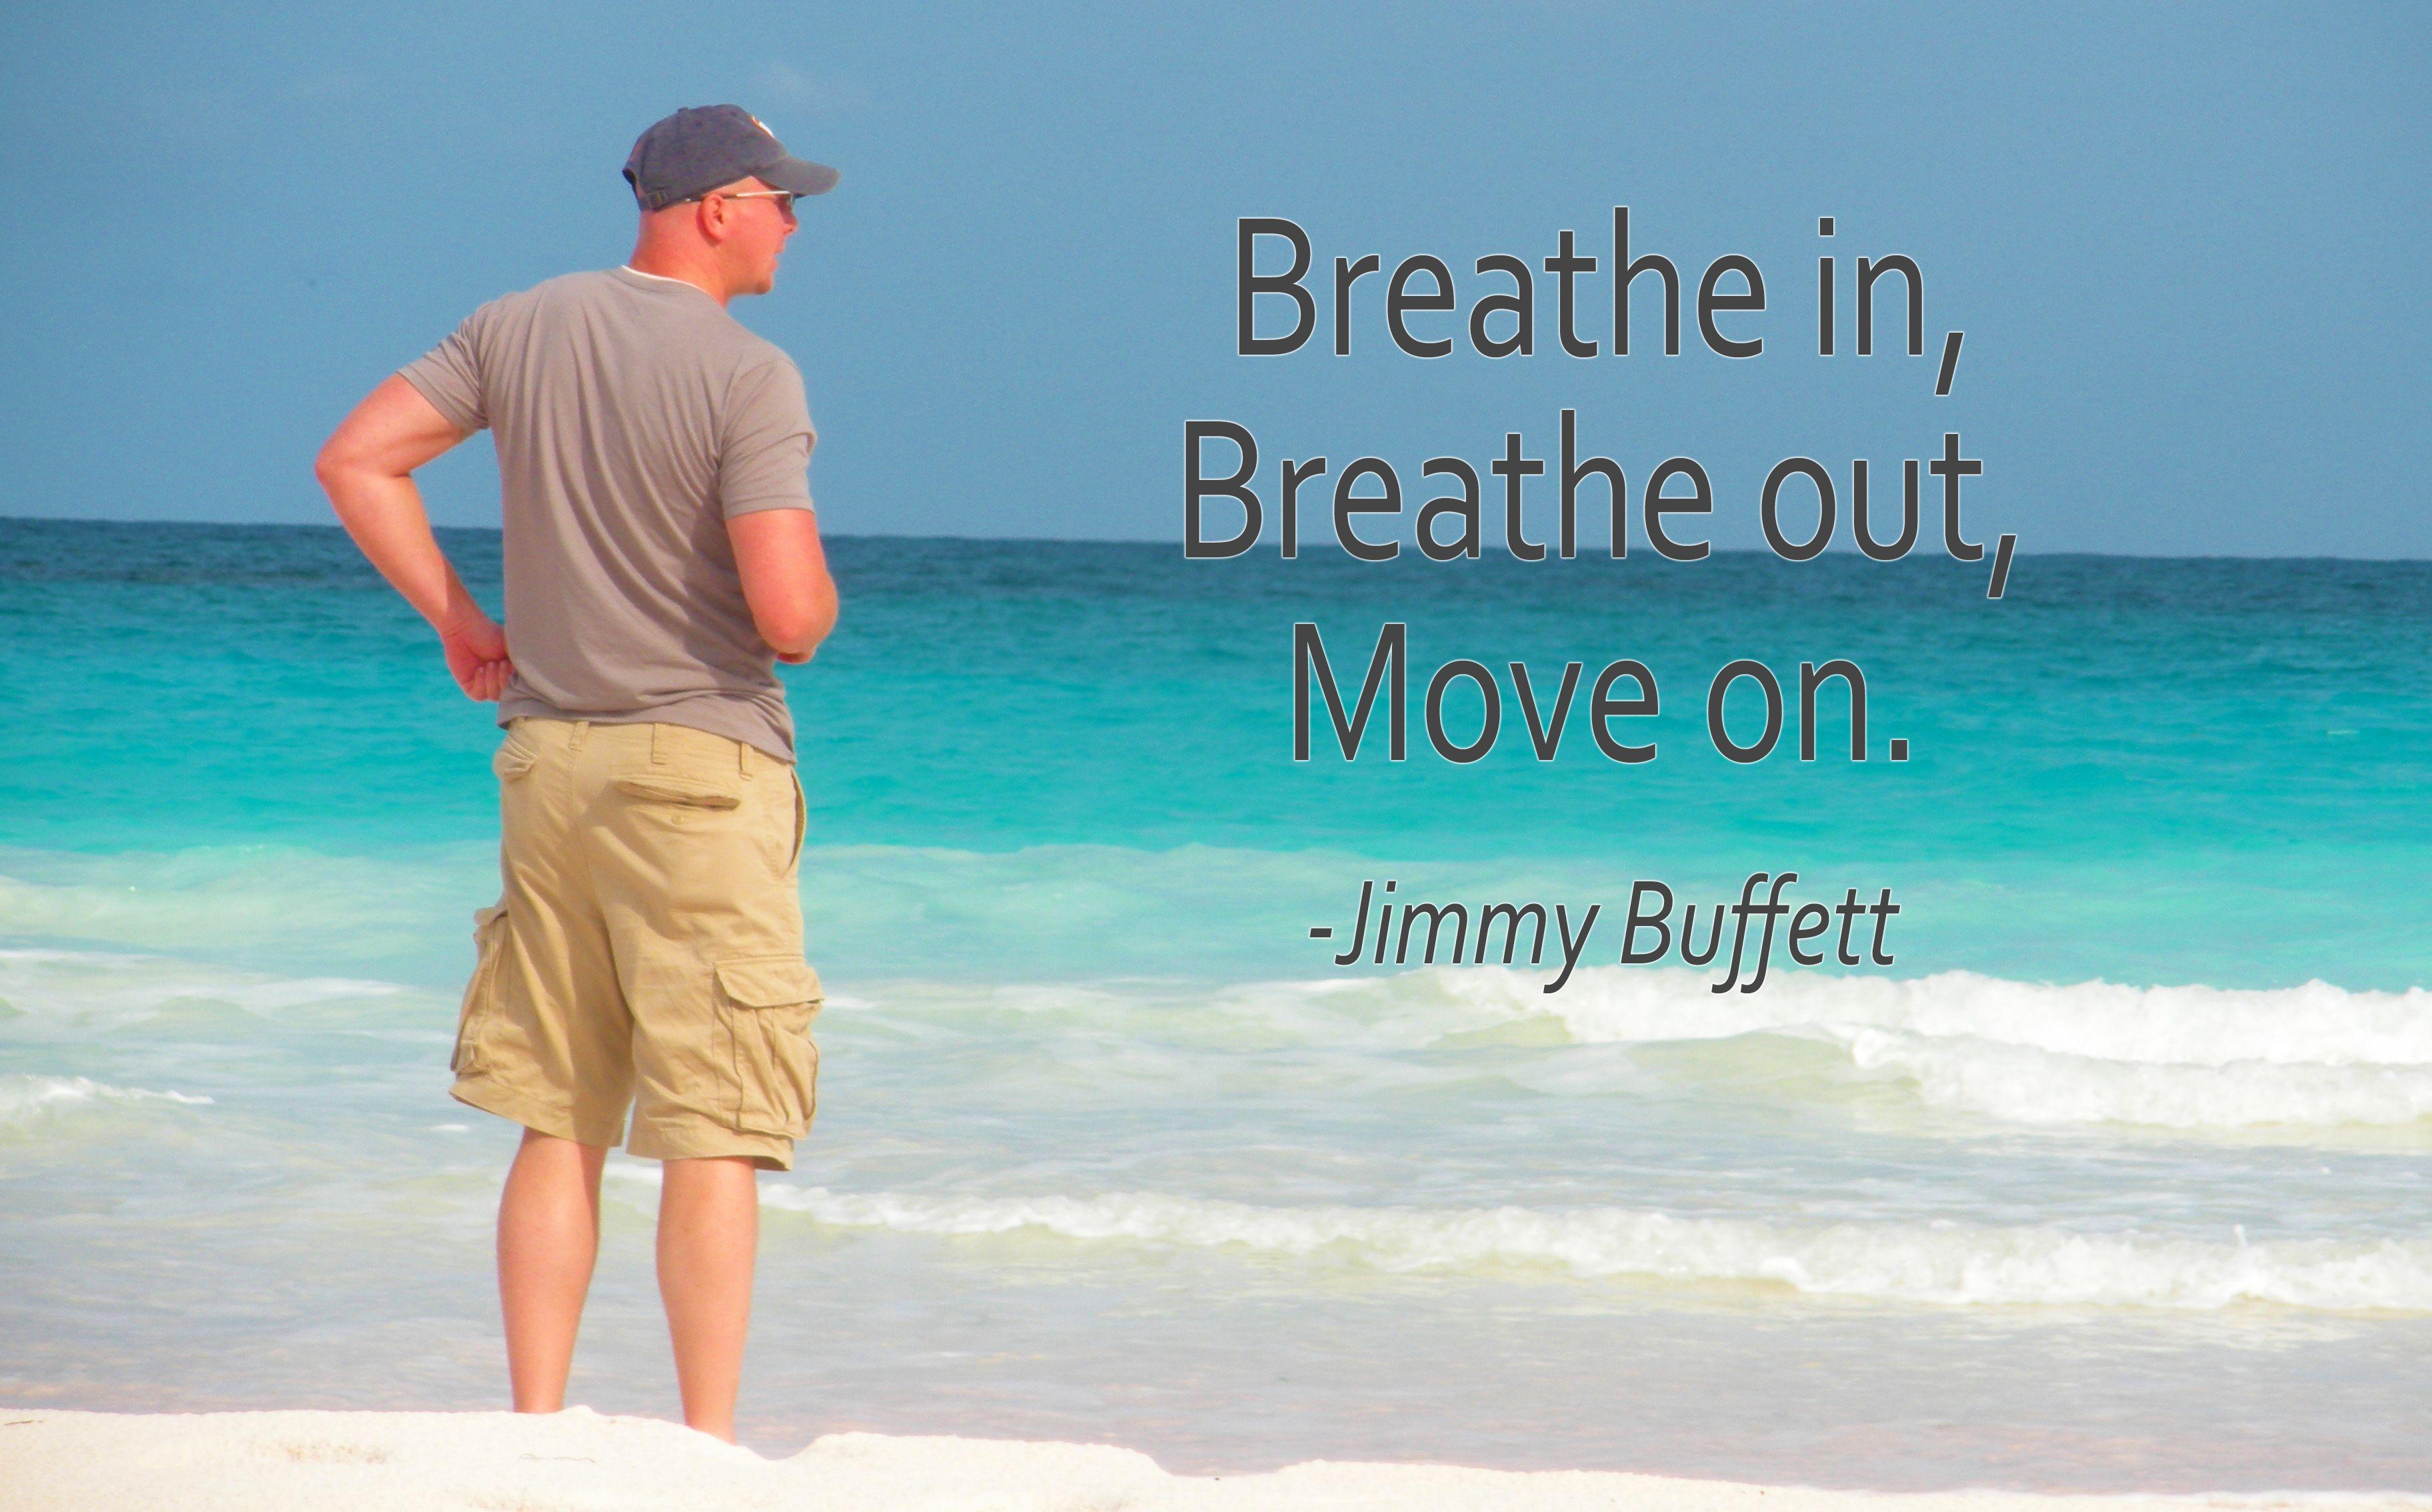 Home Caribbean Castaways Blog Podcast Jimmy Buffett Quotes Beach Quotes Jimmy Buffett